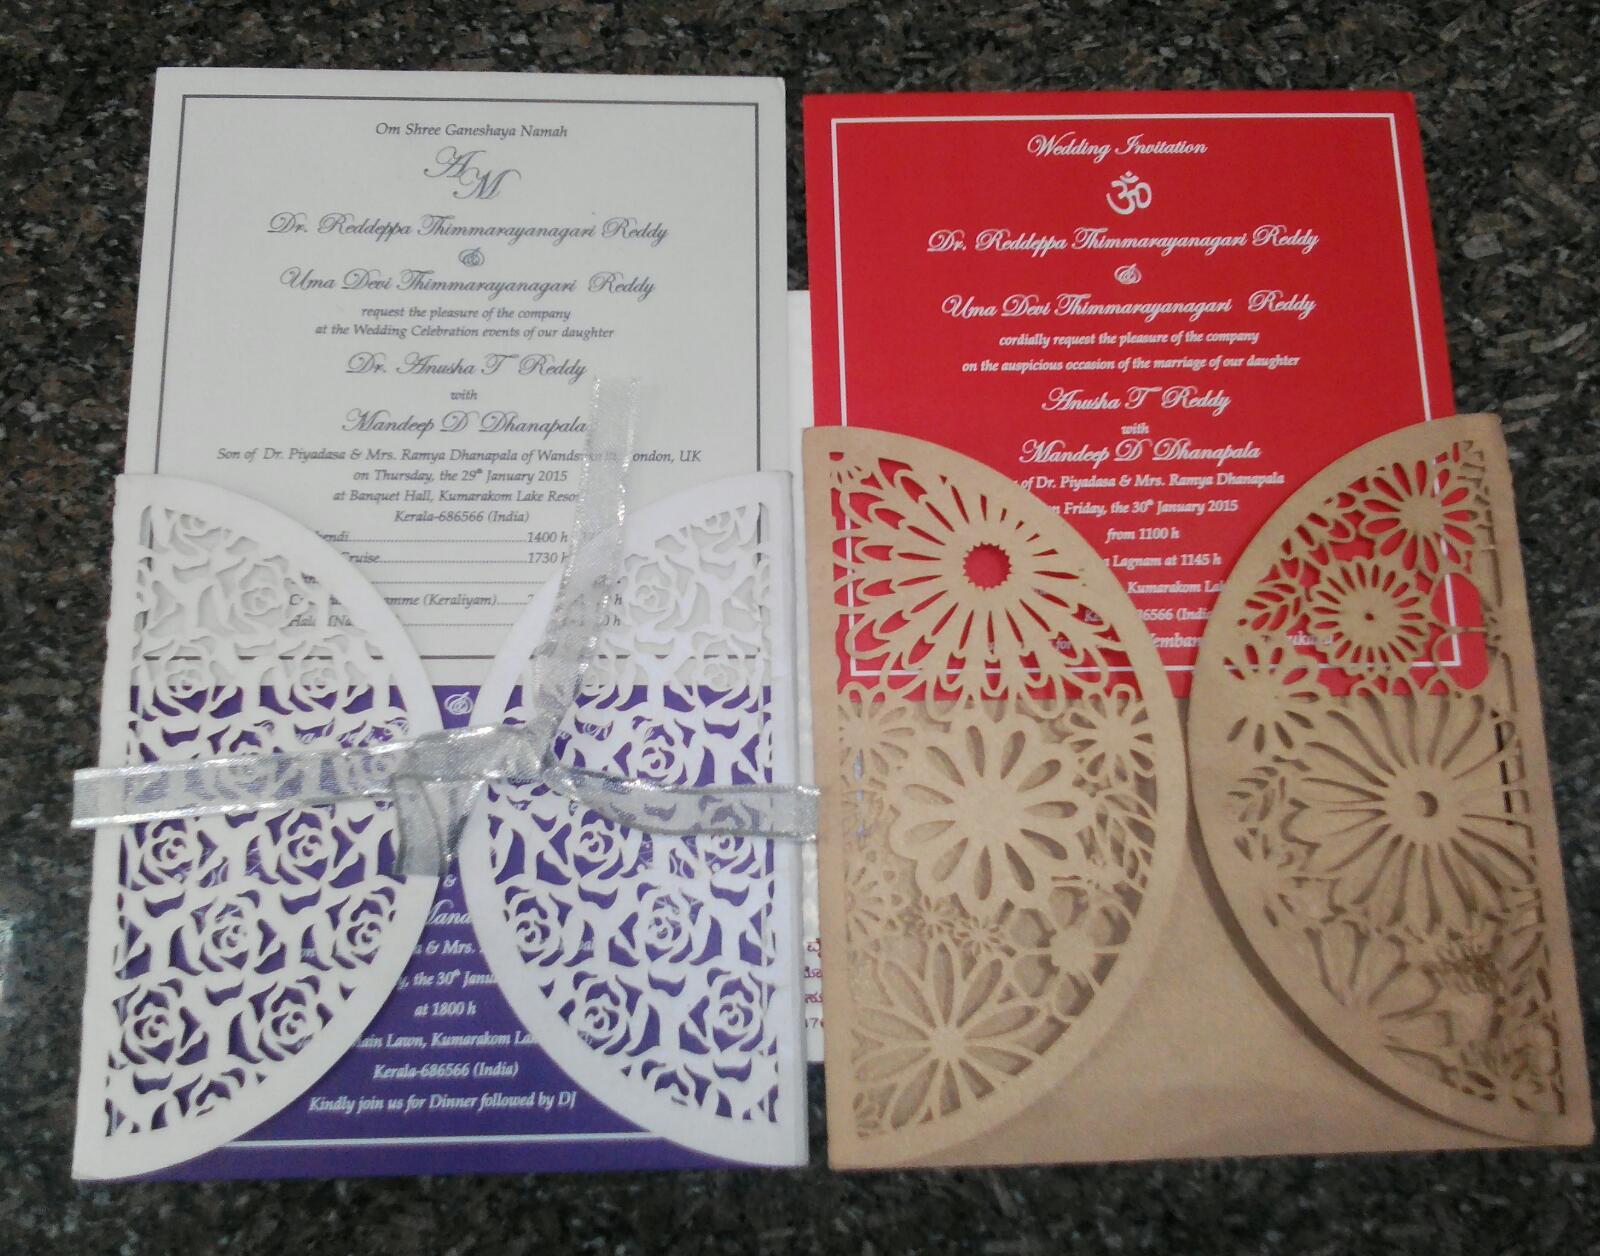 muslim wedding invitation cards in bangalore - 28 images - wedding ...